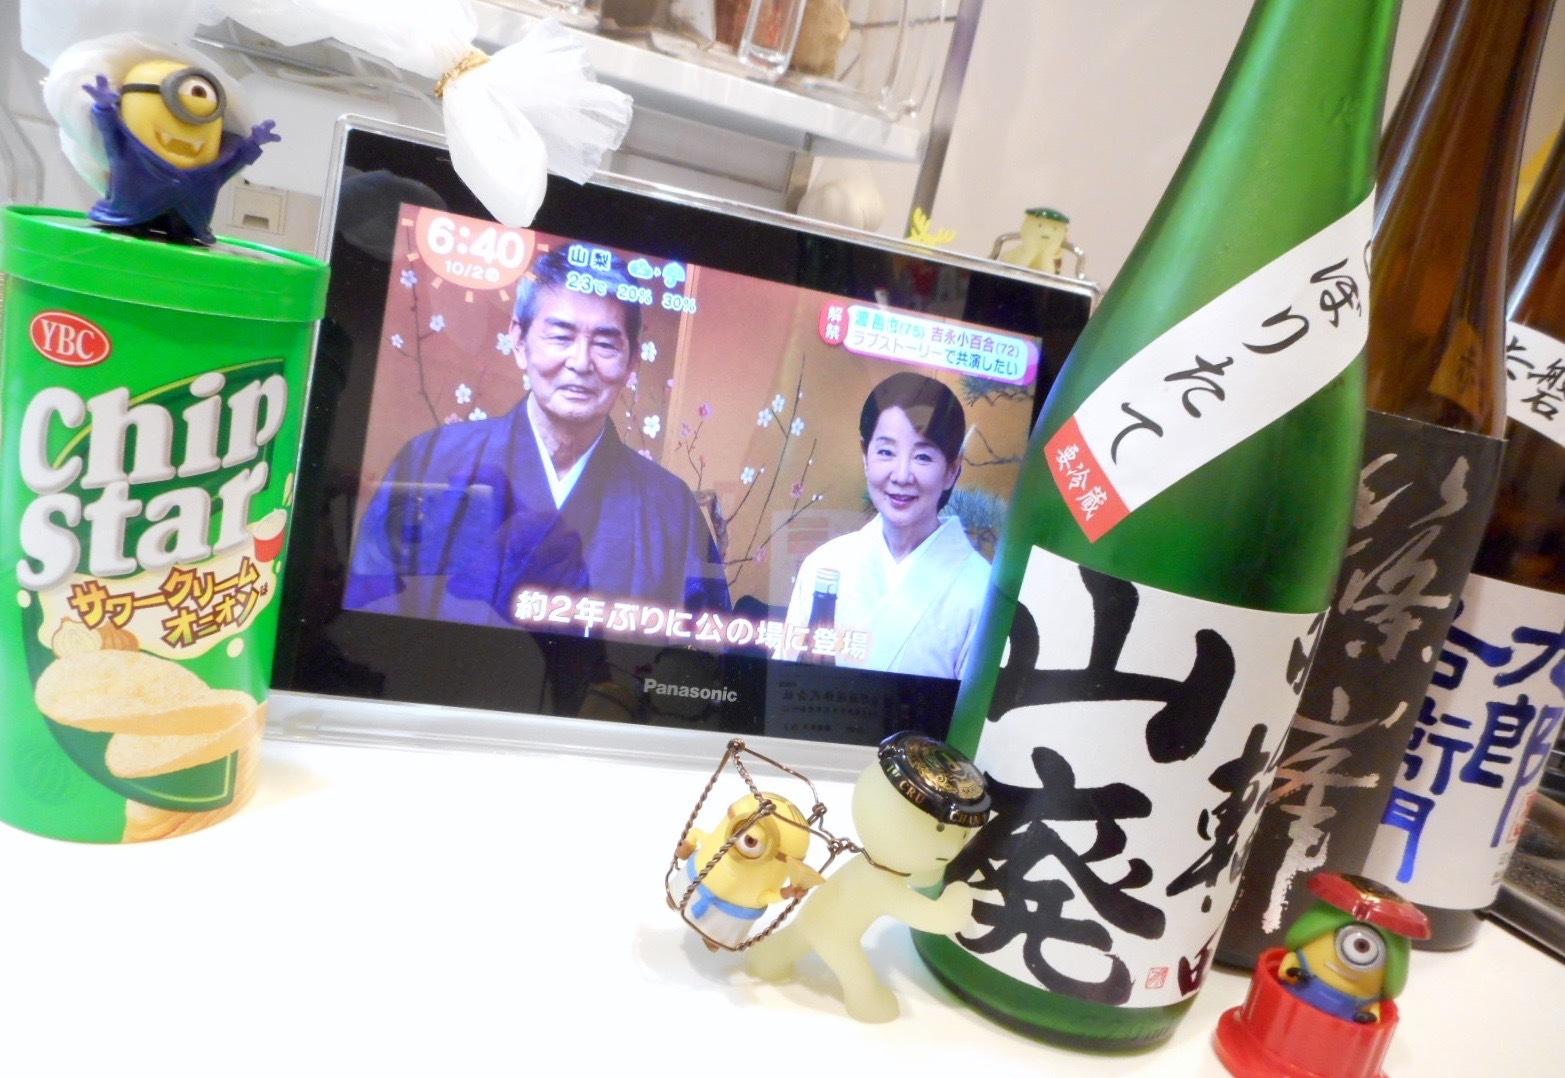 hiwata_junmai_shiboritate28by7.jpg